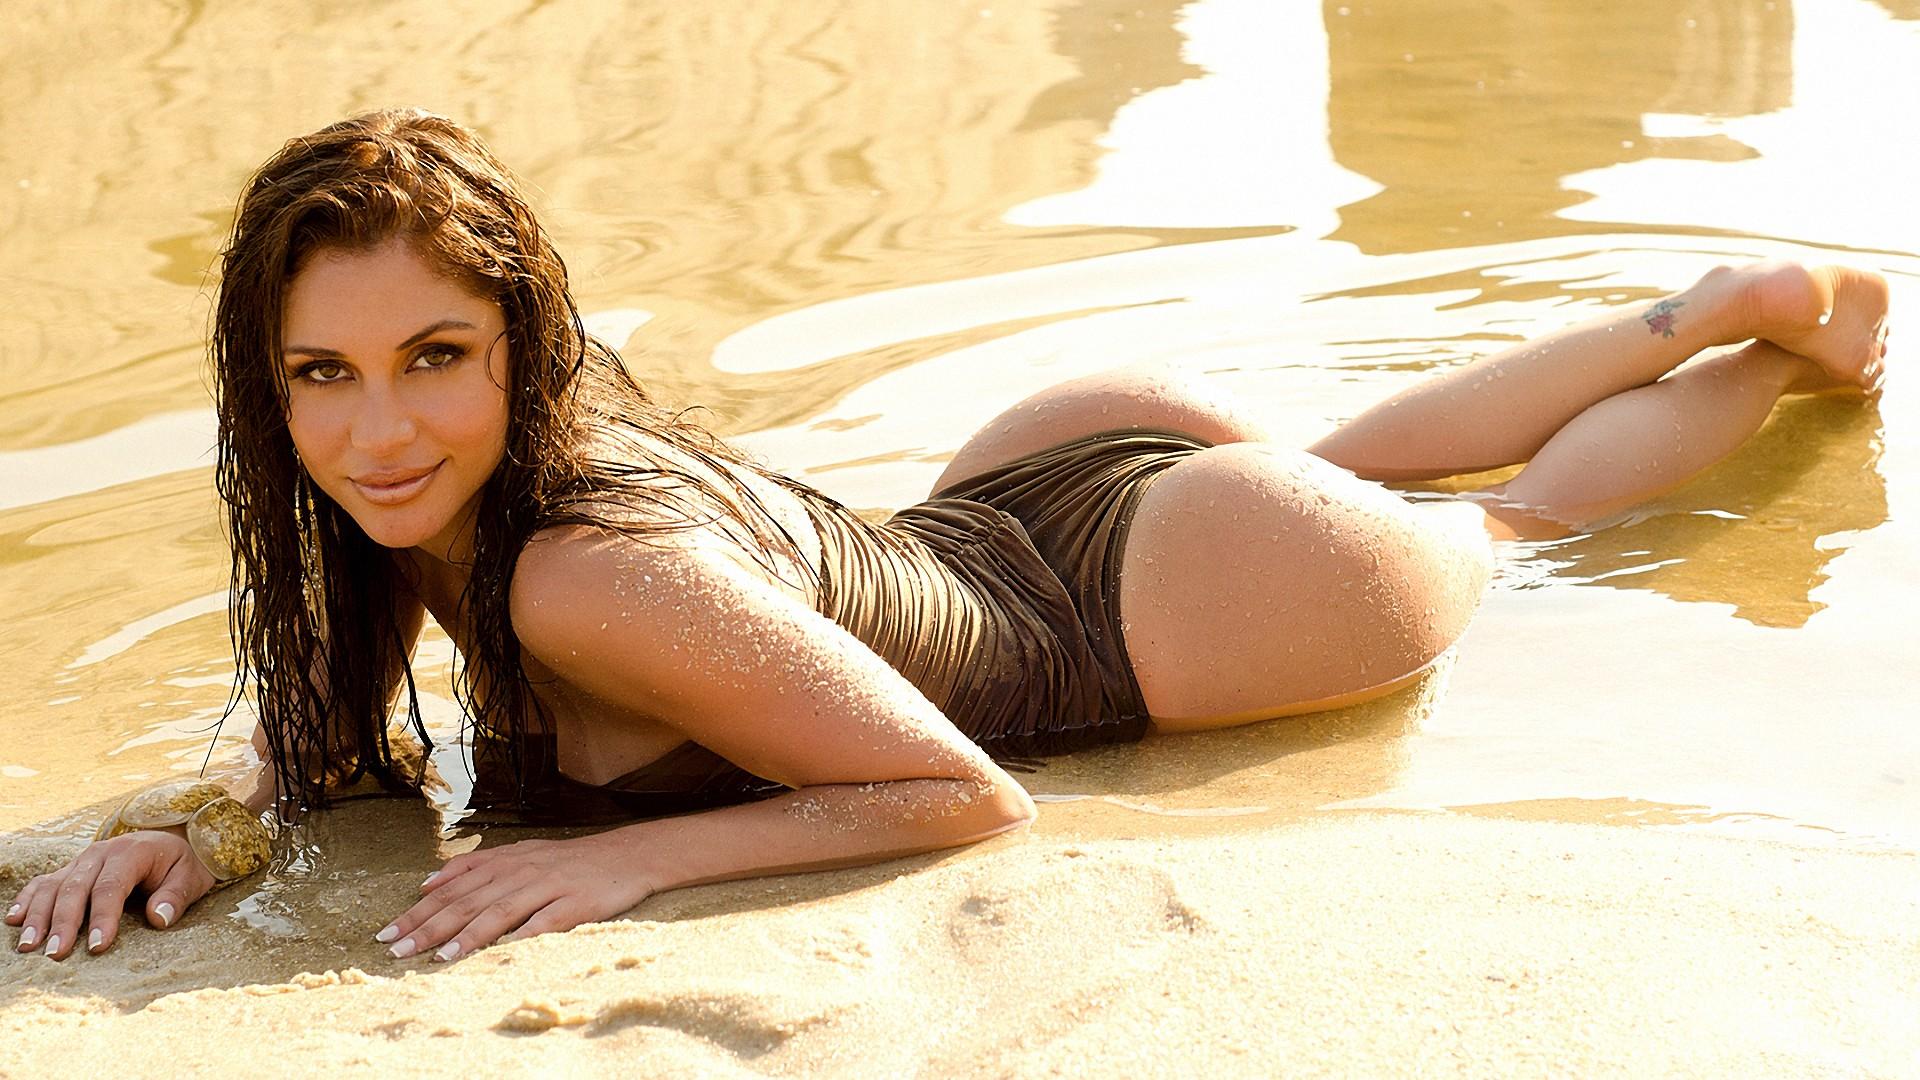 Brazilian Models Screensaver